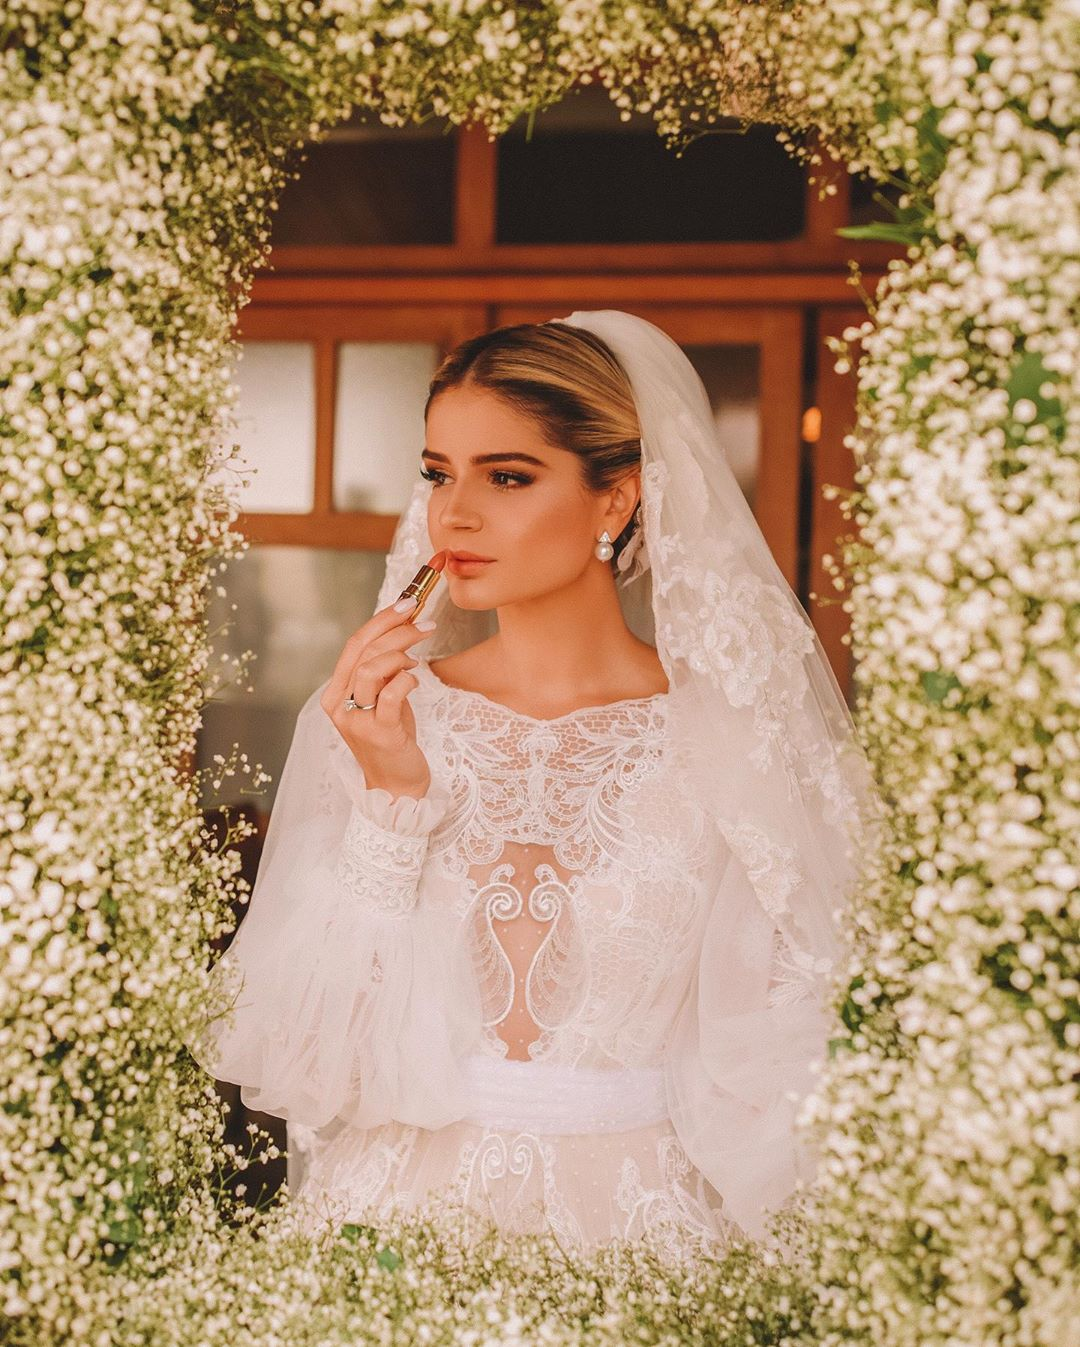 TUDO sobre o casamento da Thássia Naves!